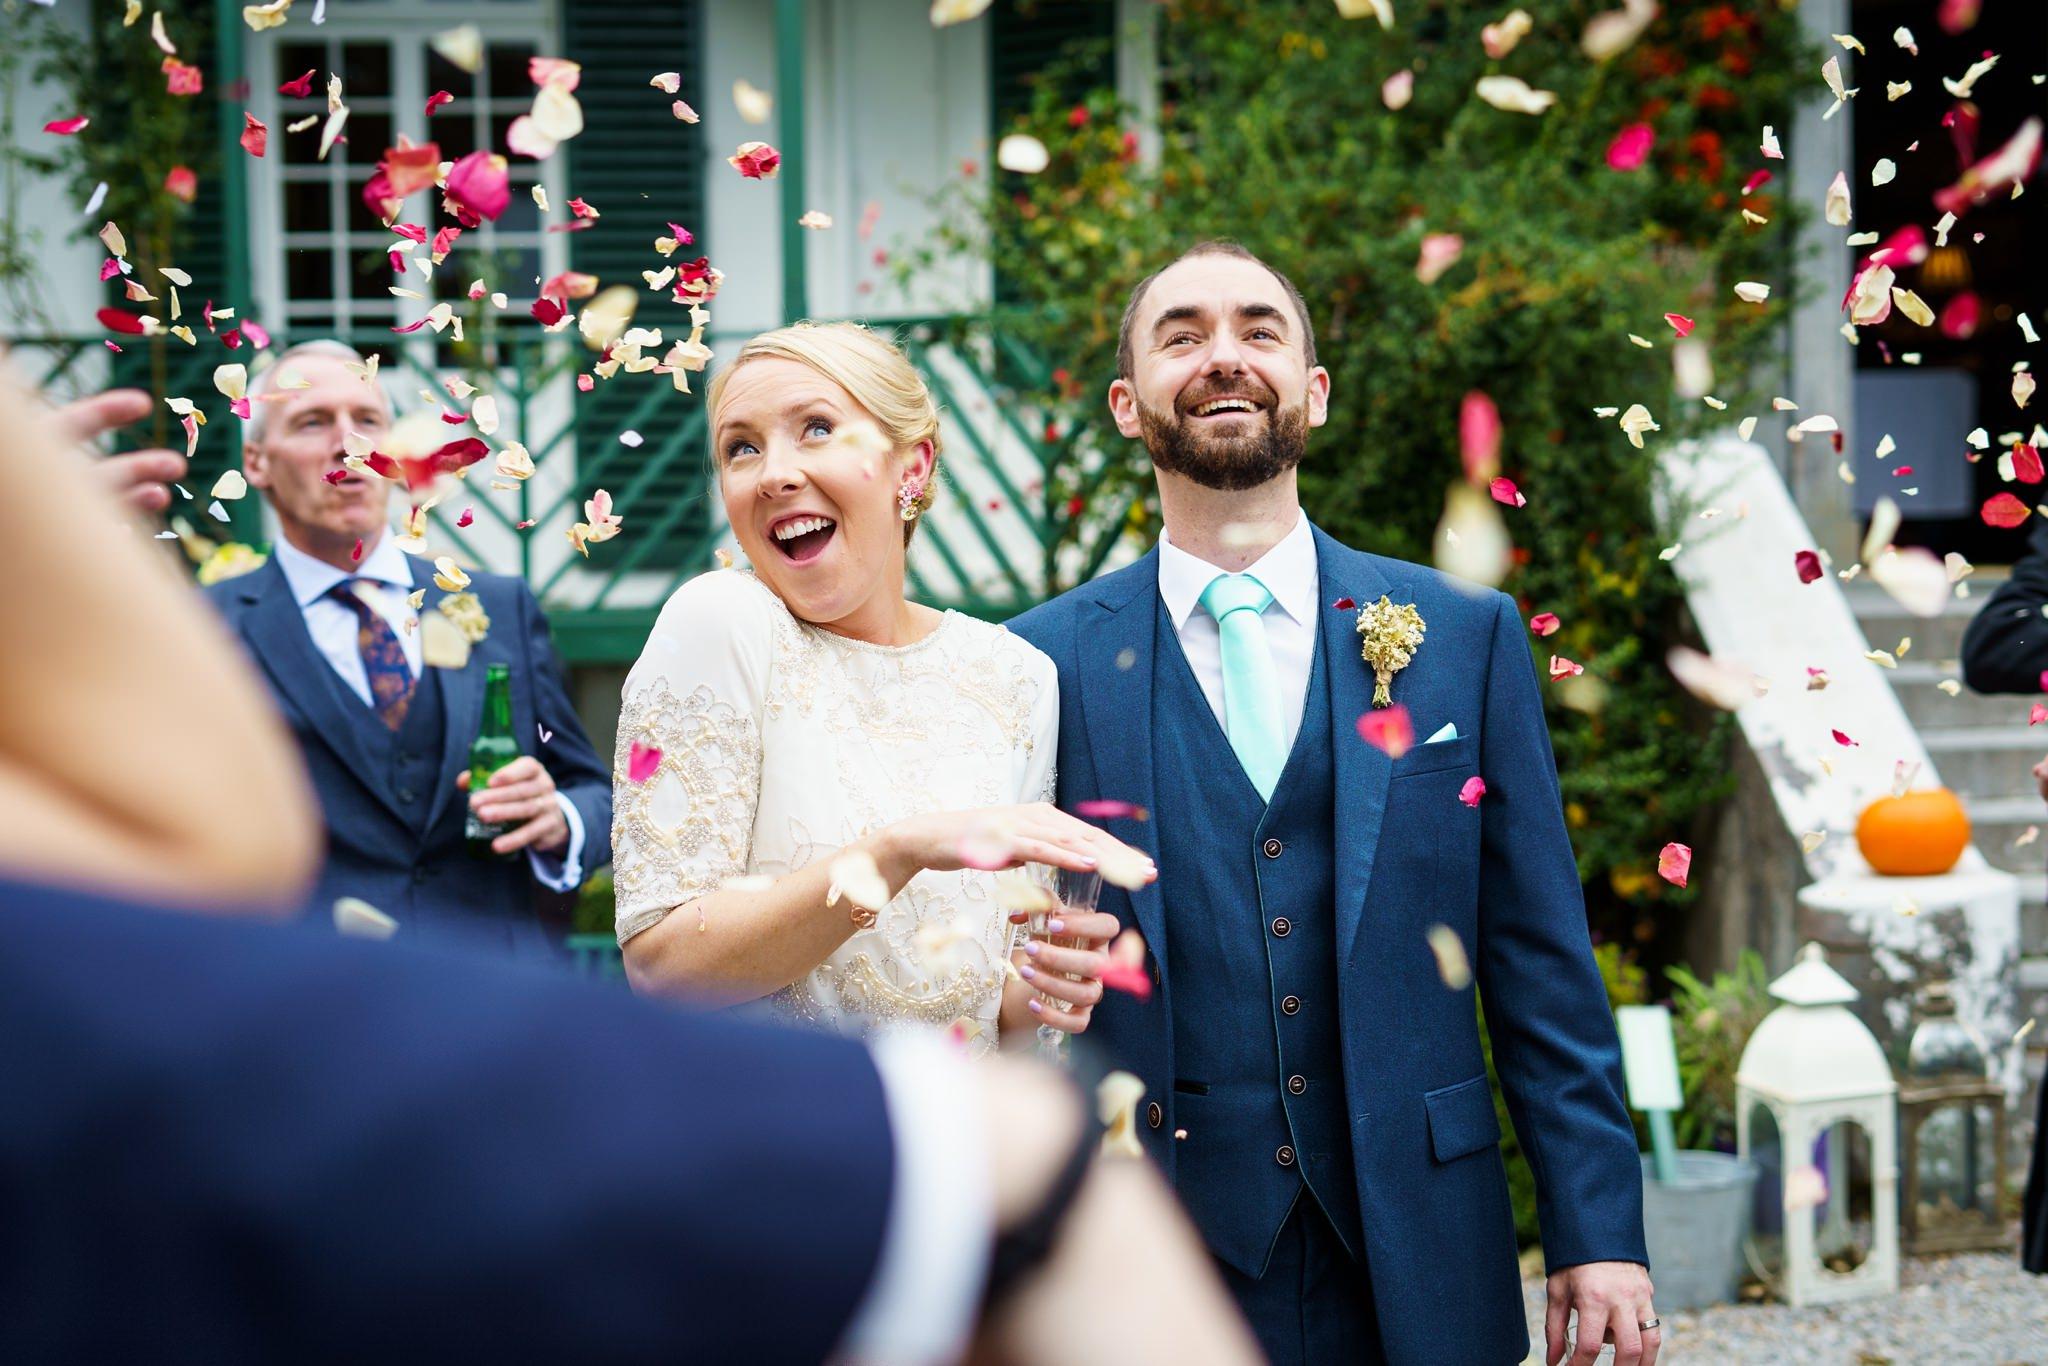 Elisha-Clarke-Photography-Dublin-City-Wedding_0080.jpg